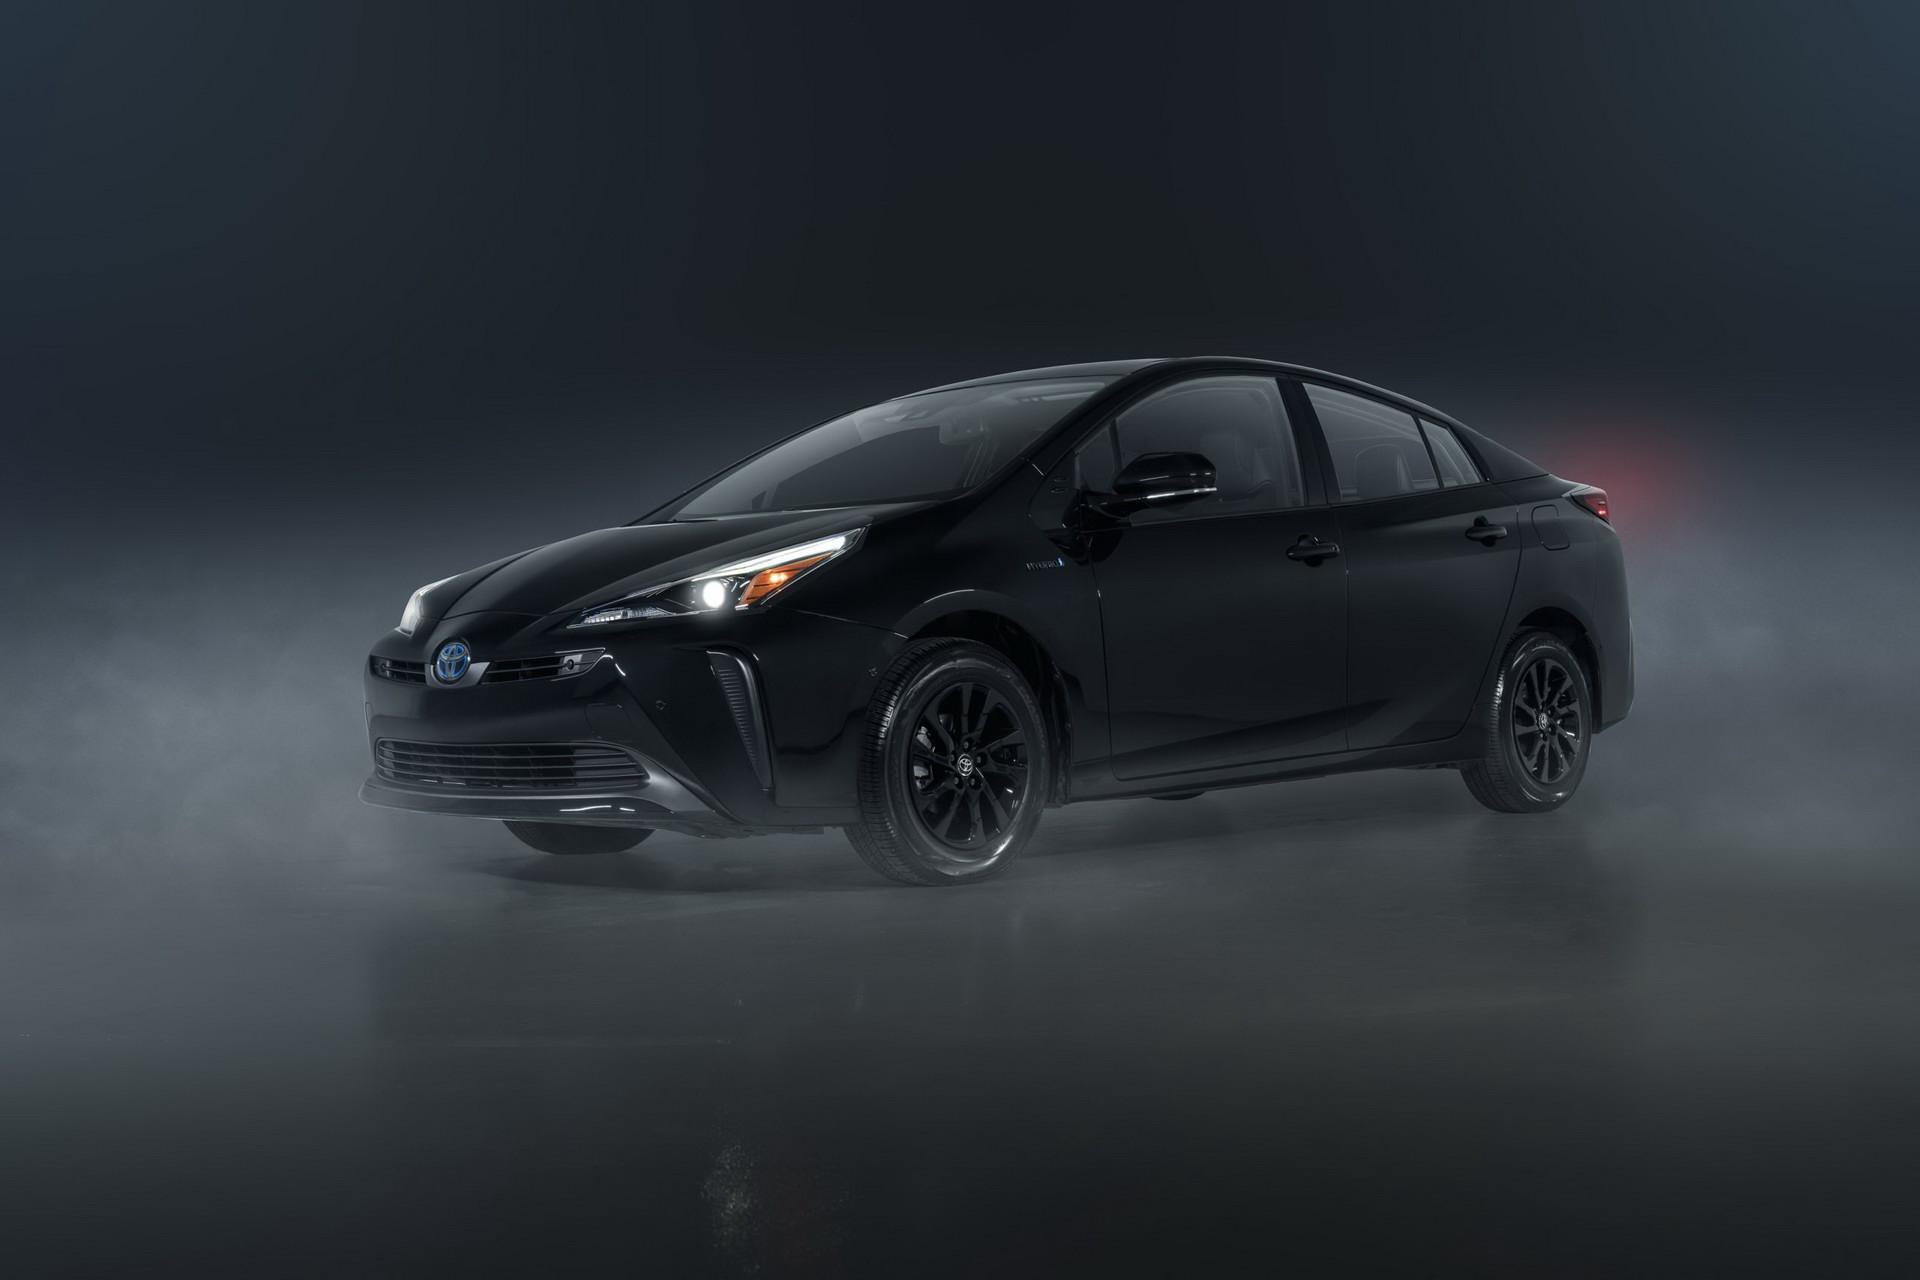 Toyota-Prius-Nightshade-Edition-2